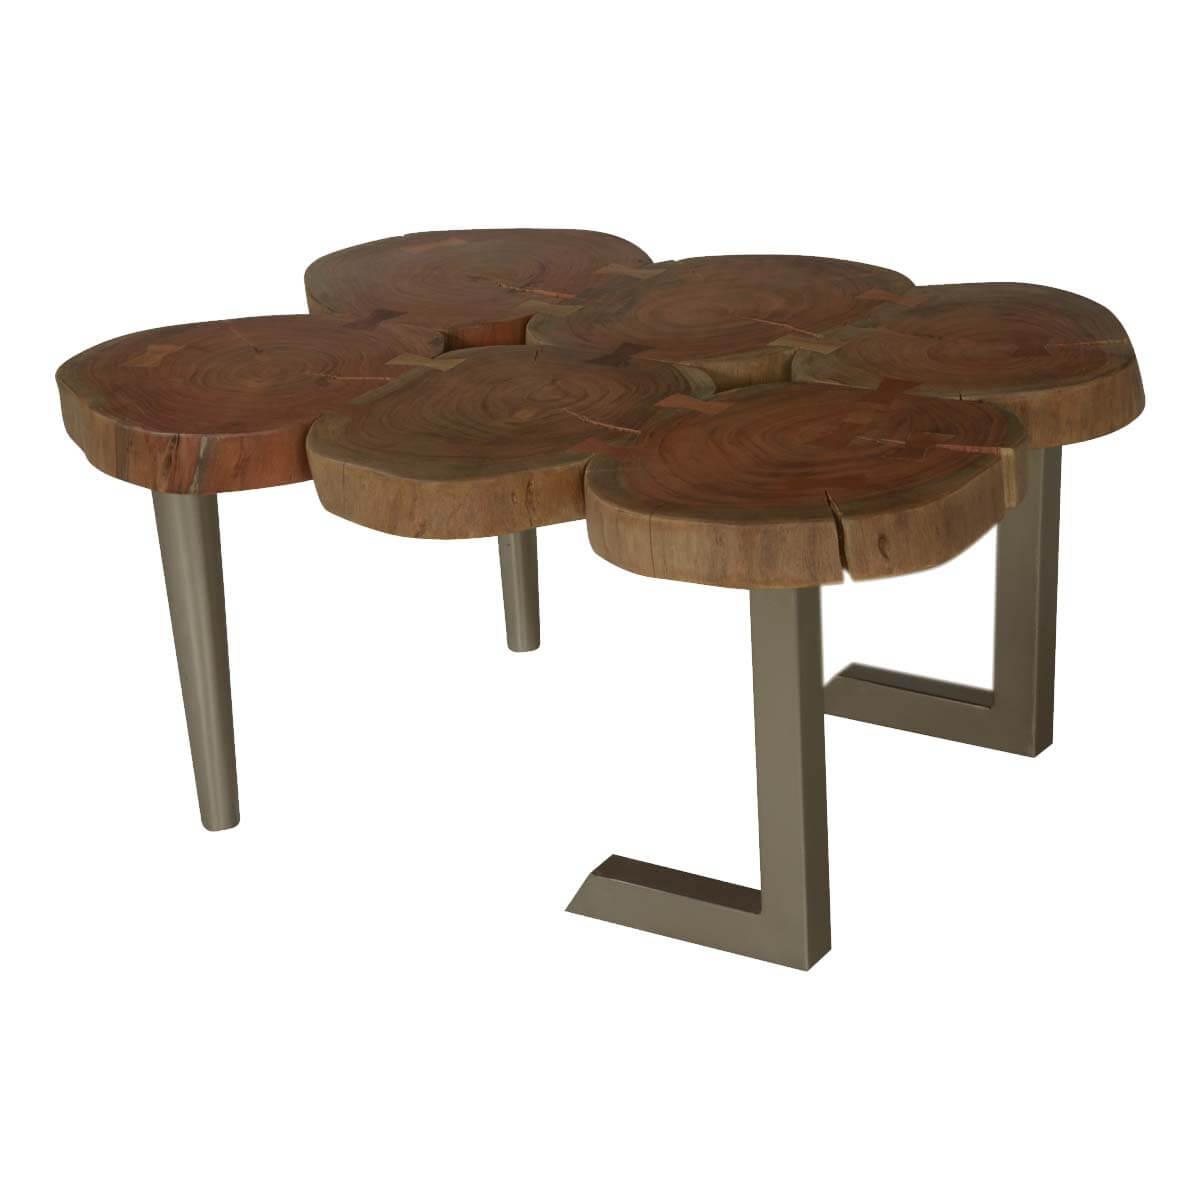 6 Stump Table Top Acacia Wood & Iron Centerpiece Coffee Table